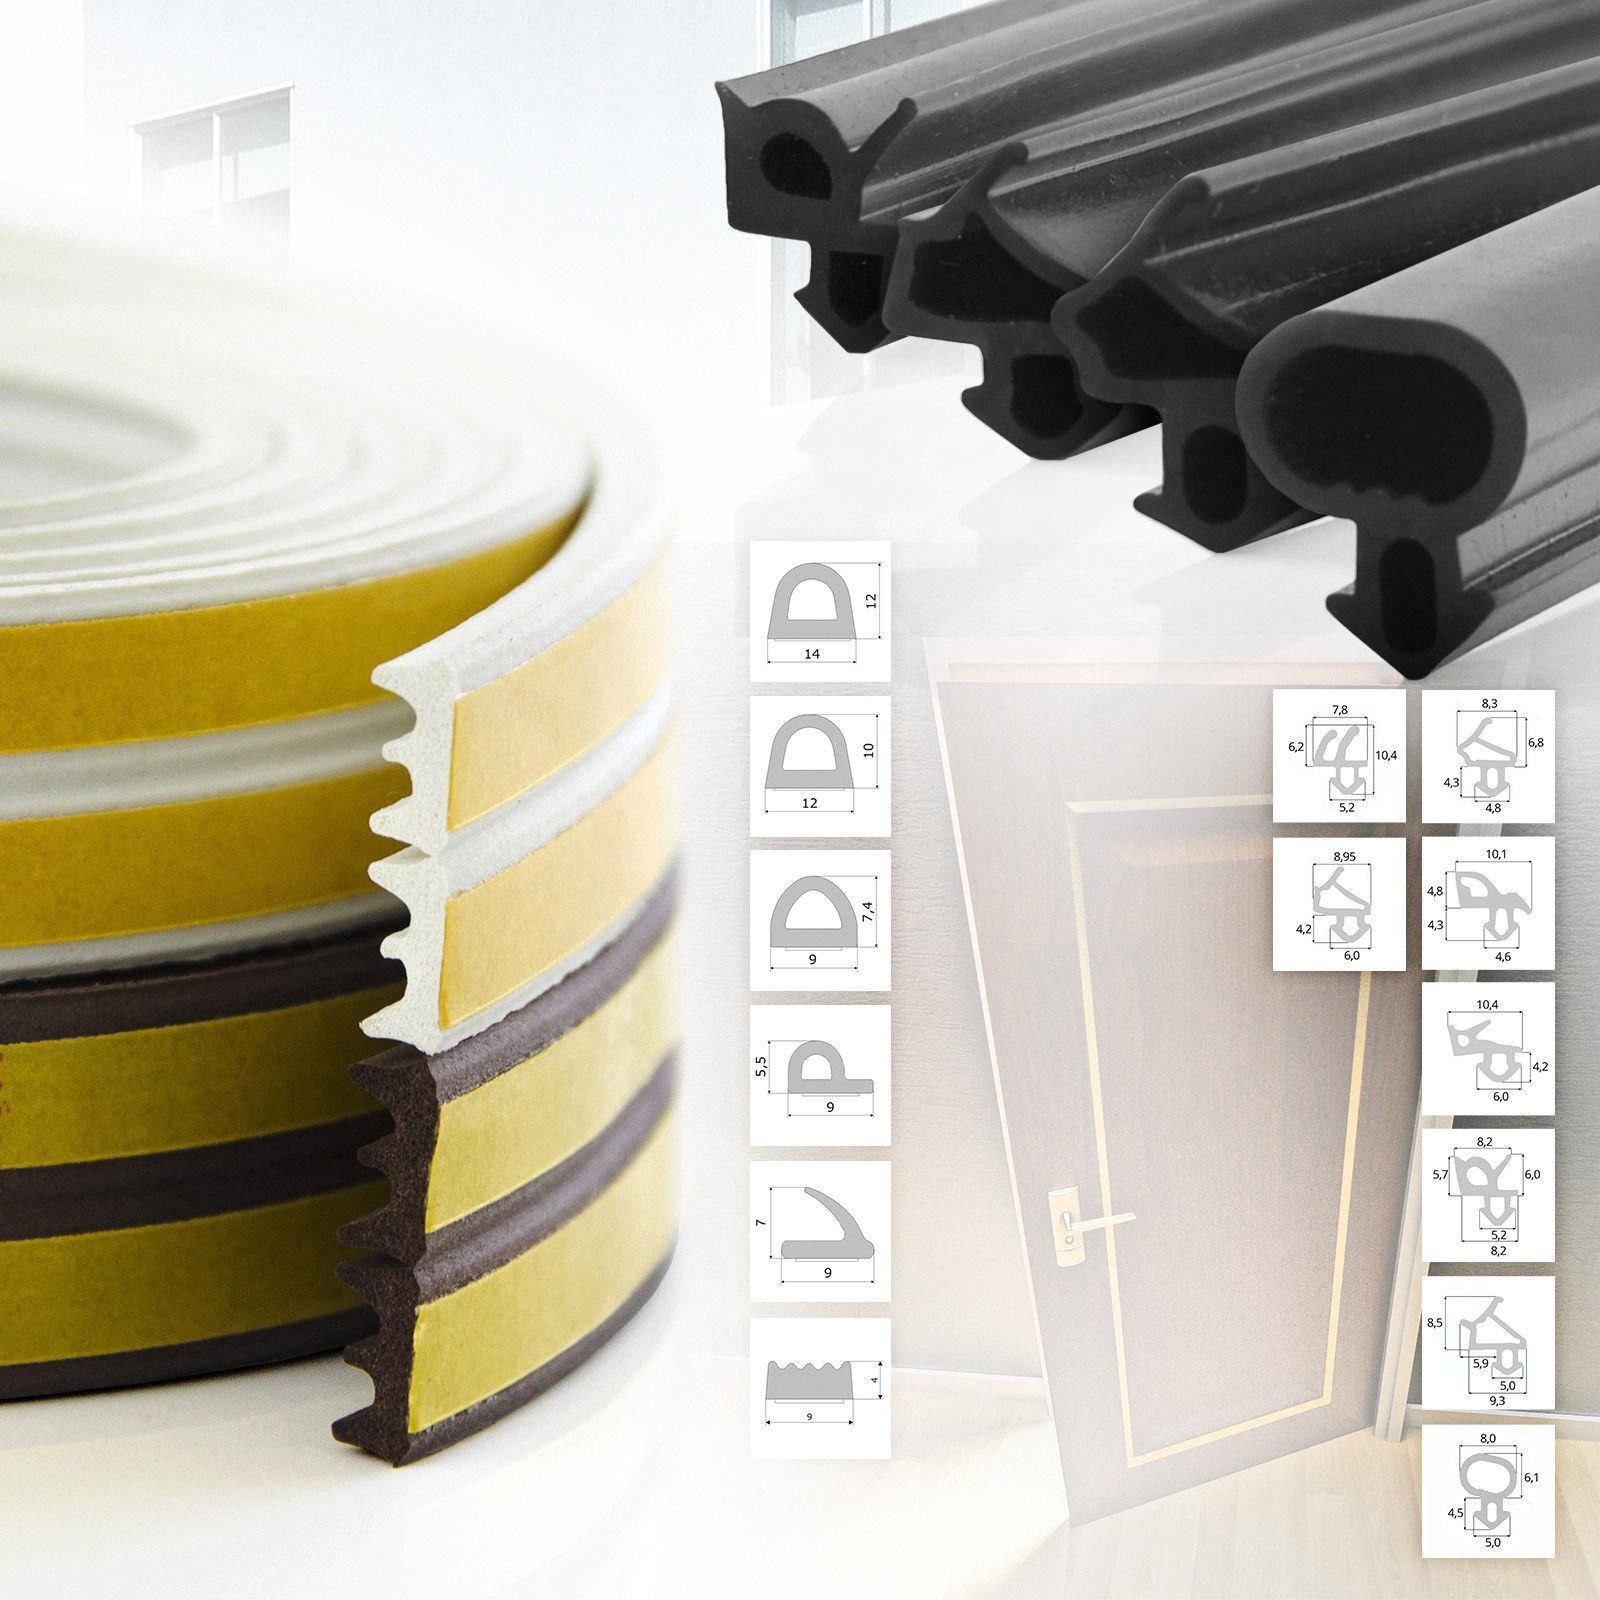 Fensterdichtung selbstklebend Gummidichtung Rehau Veka 15 Modelle 3 Farben EPDM